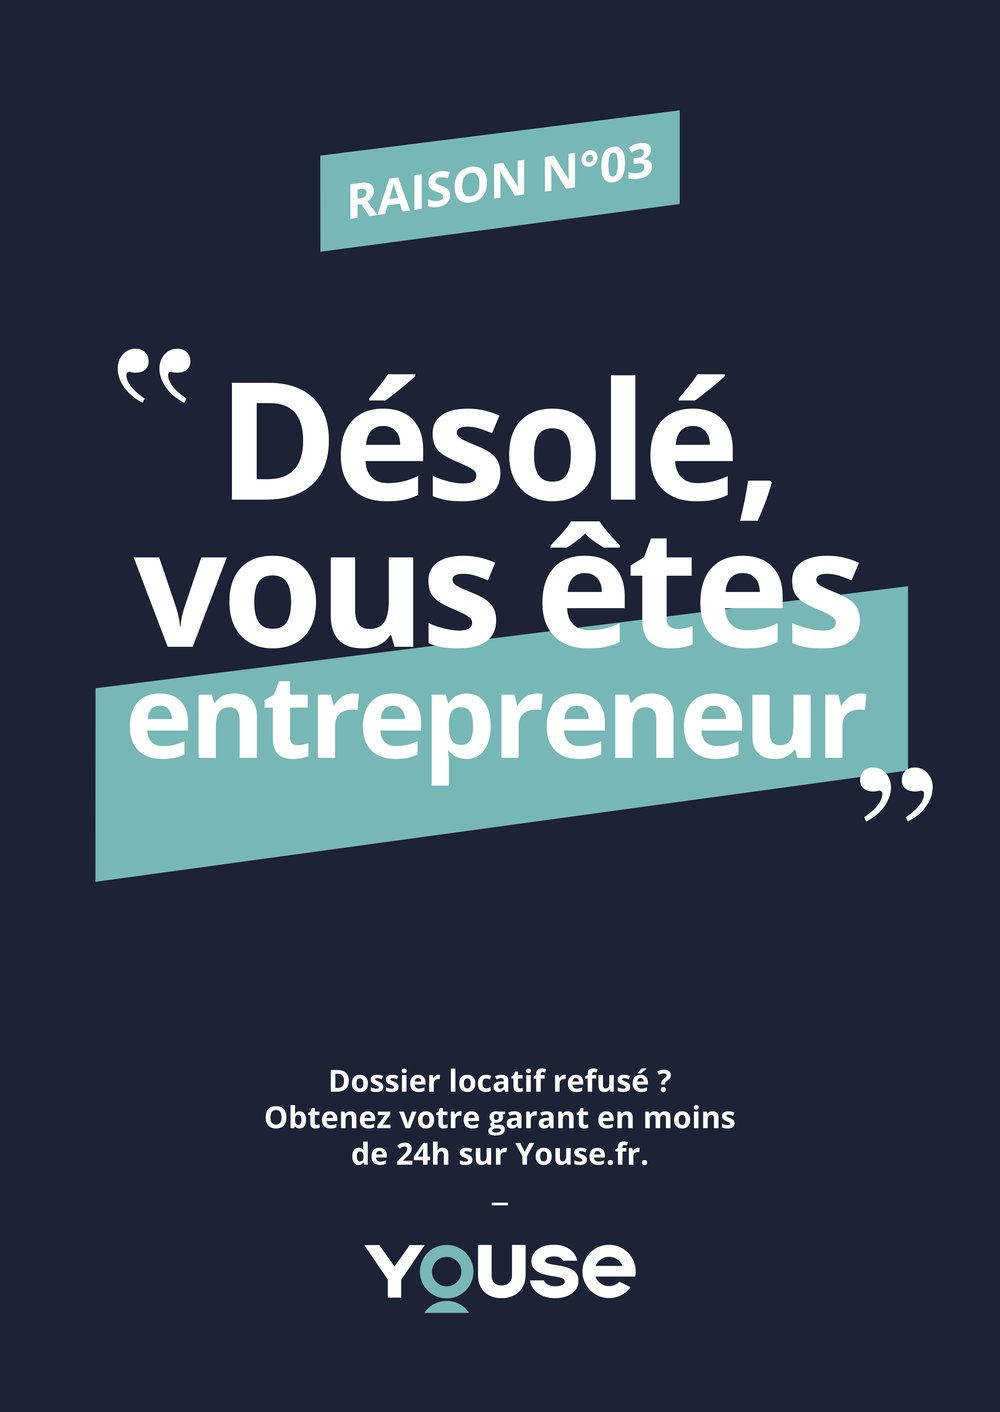 YOUSE_Affiche_Entrepreneur_845x1193mm_01.jpg